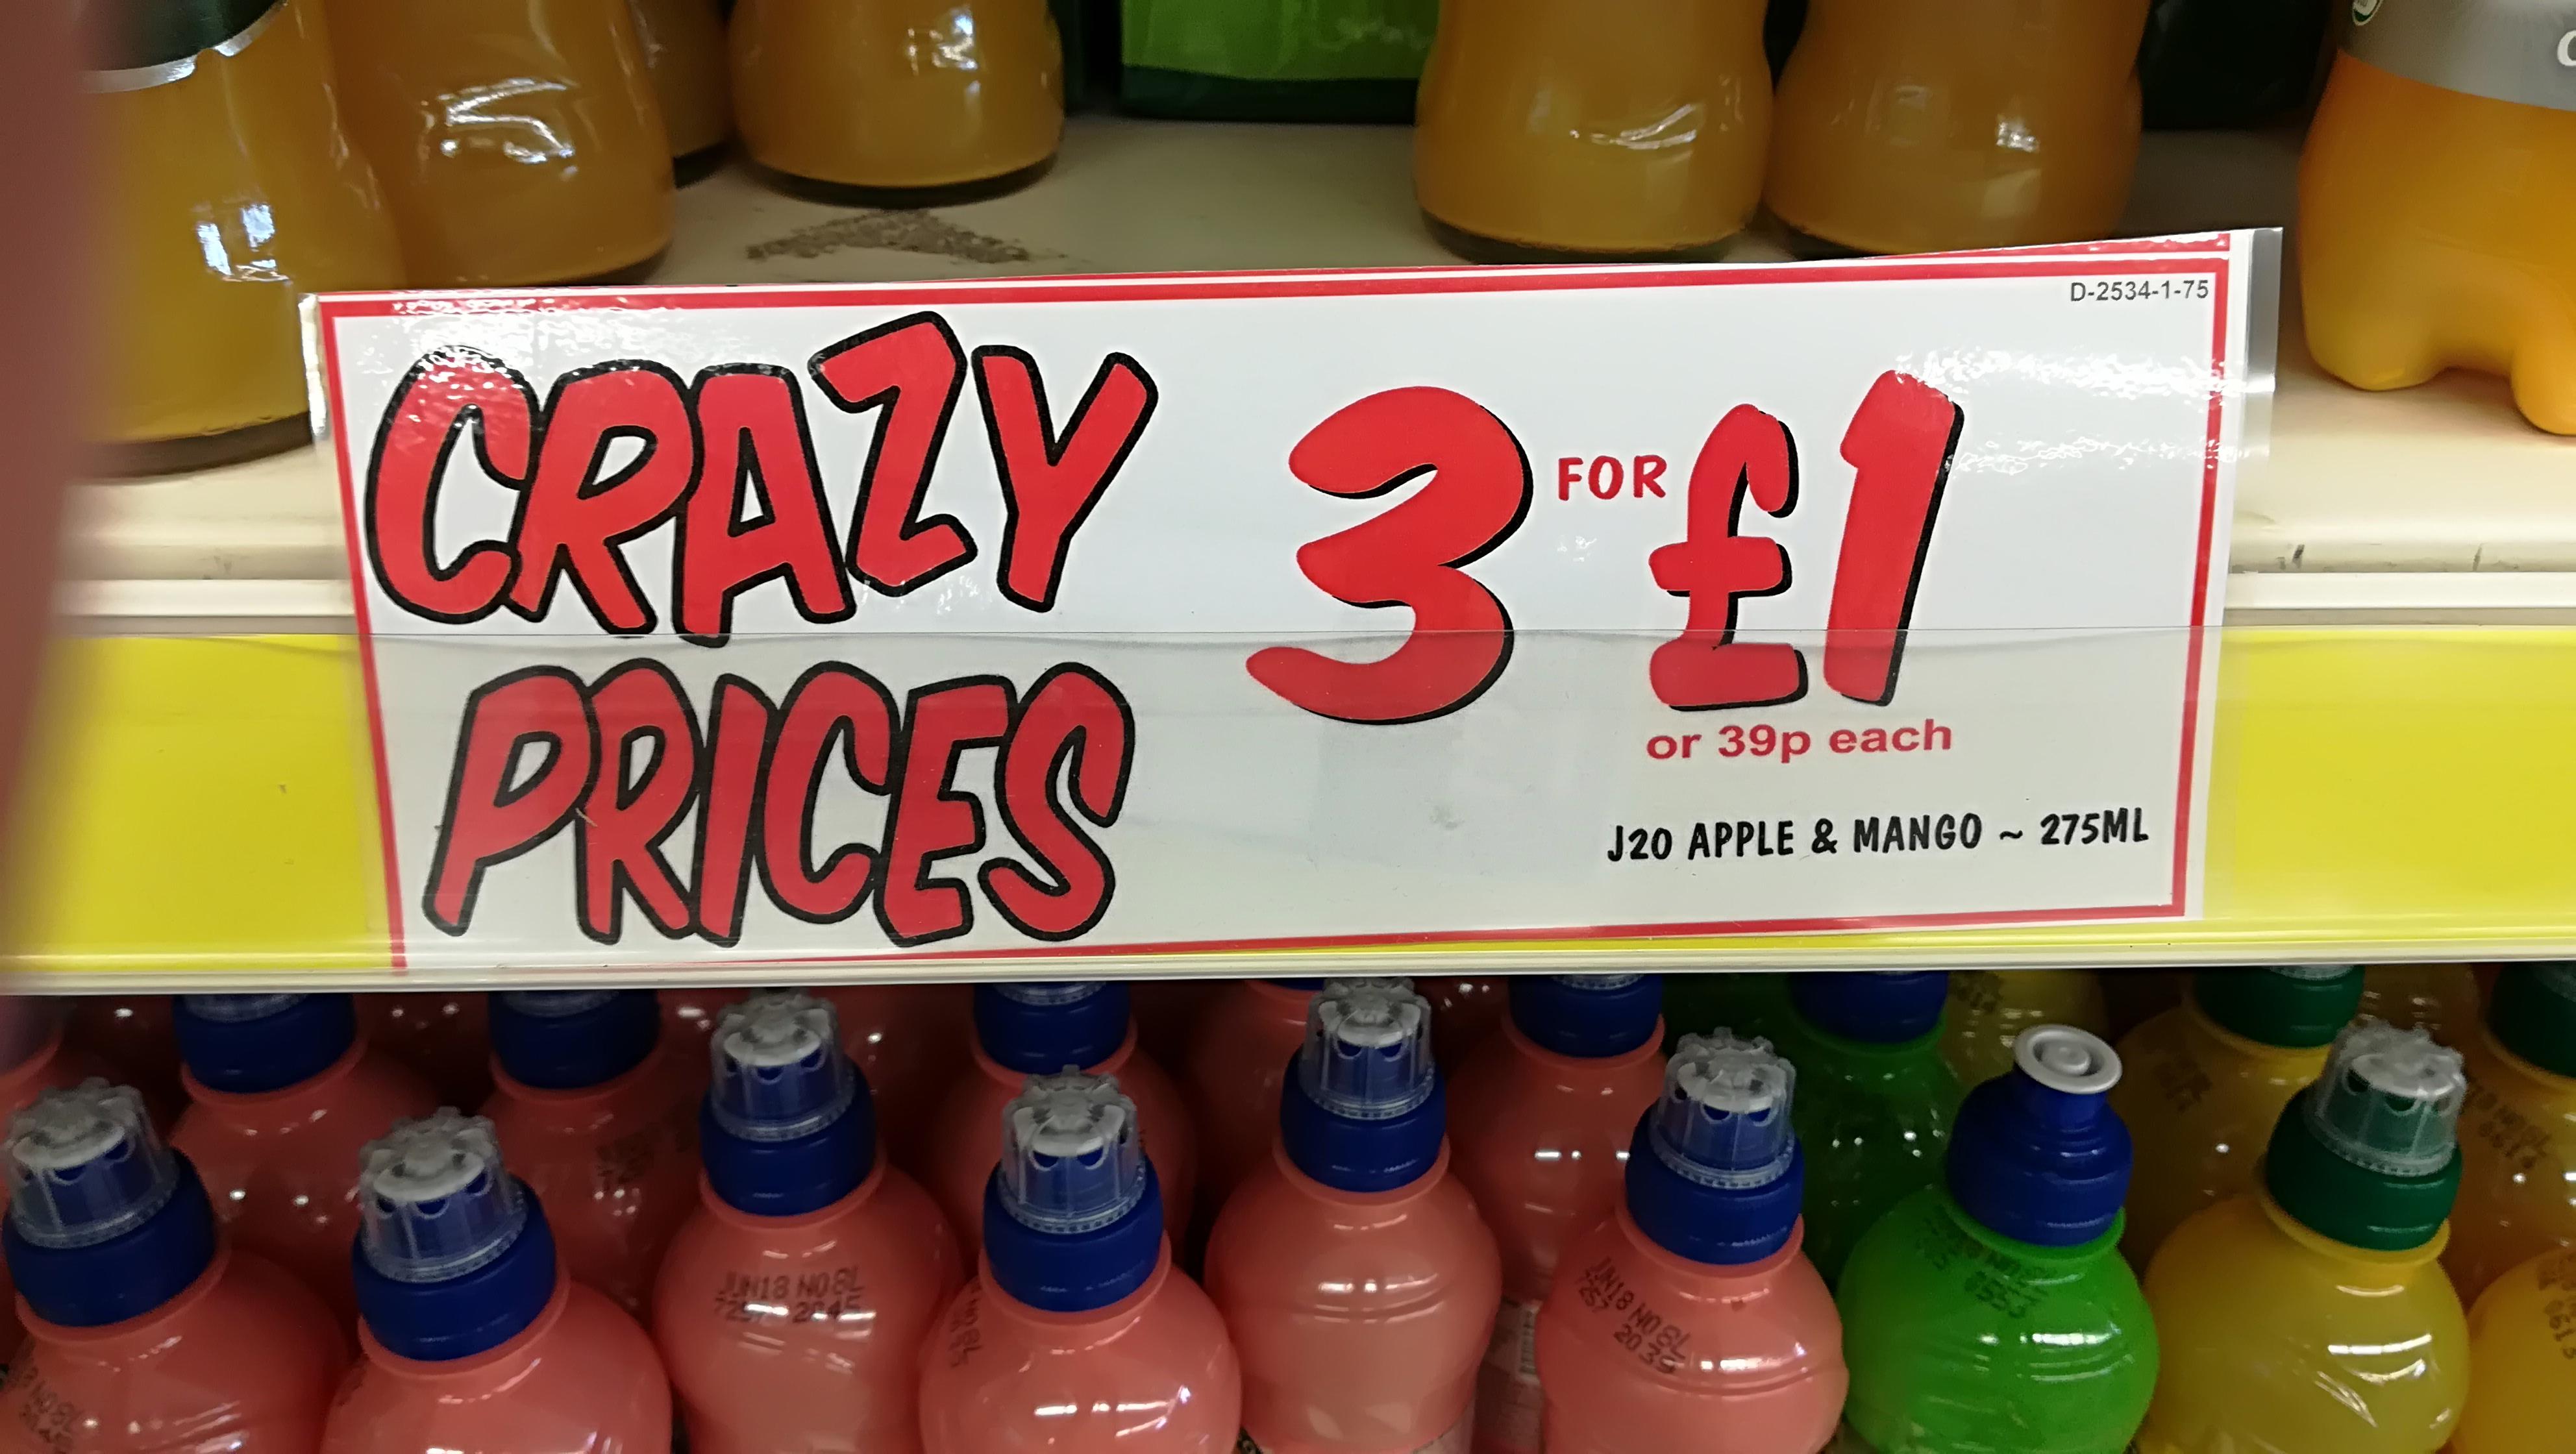 J2O various varieties - 3 bottles for £1 @ Fultons Foods (Other deals in the OP)